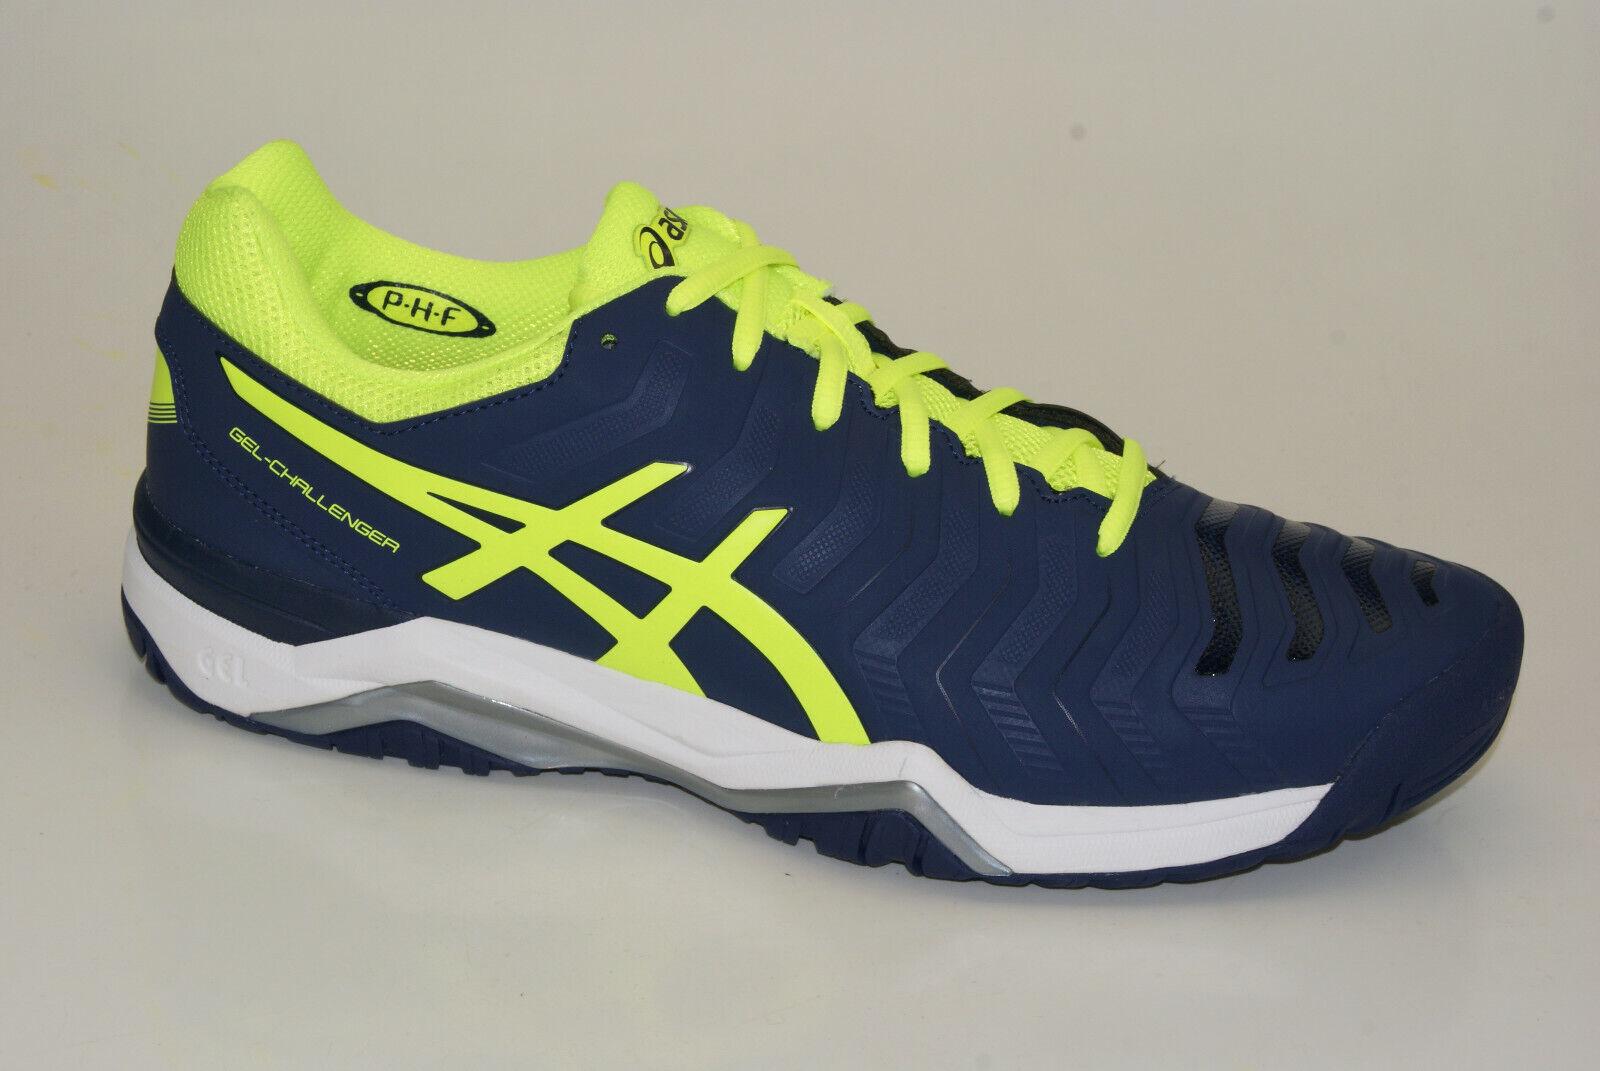 Asics Gel-Challenger 11 tennischuhe Trainers Mens Sport shoes E703Y-4907